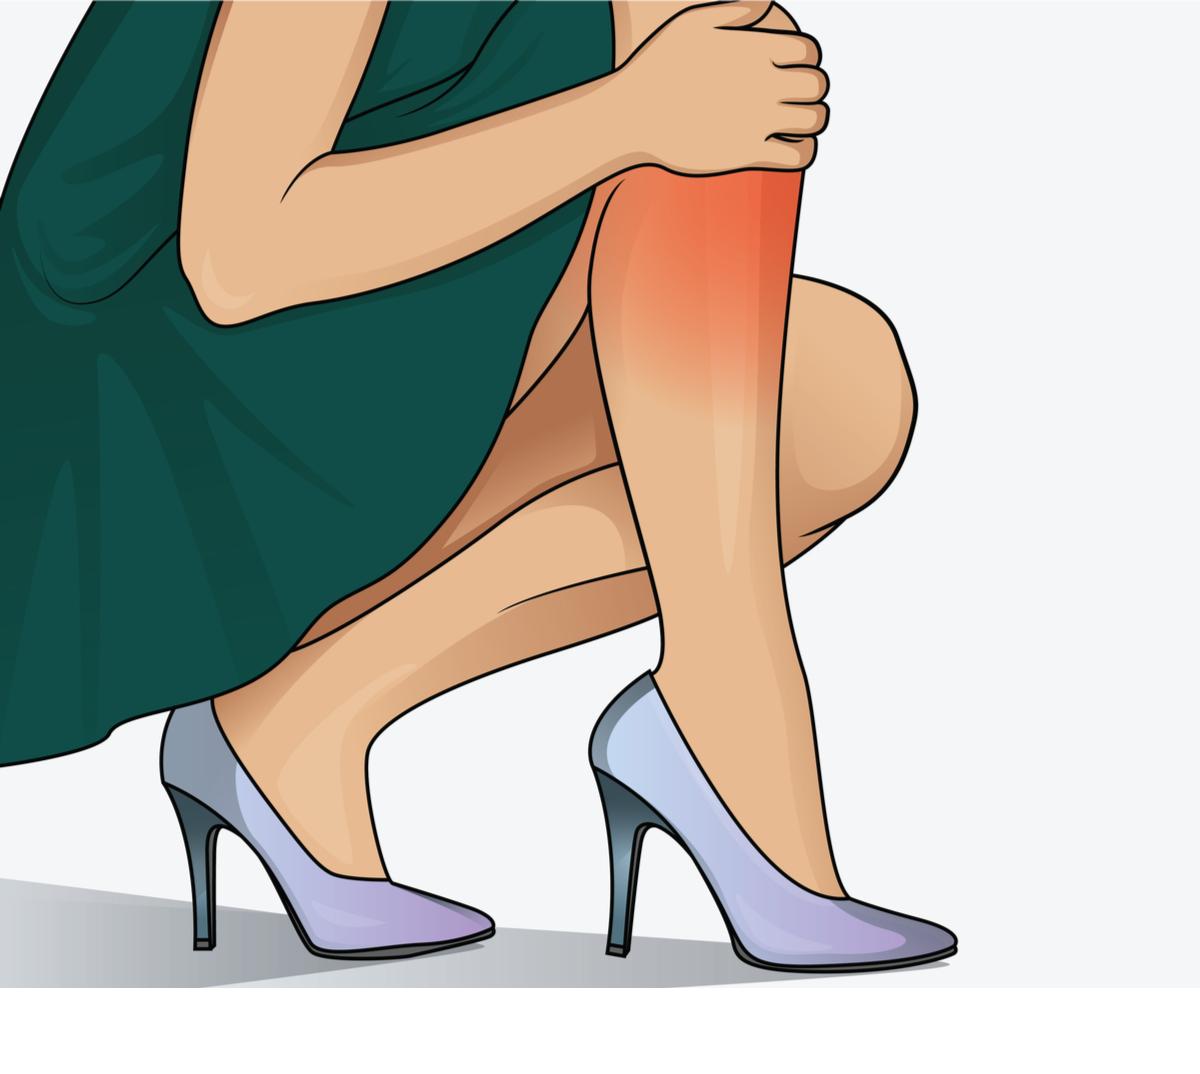 venele de sandal și varicoase